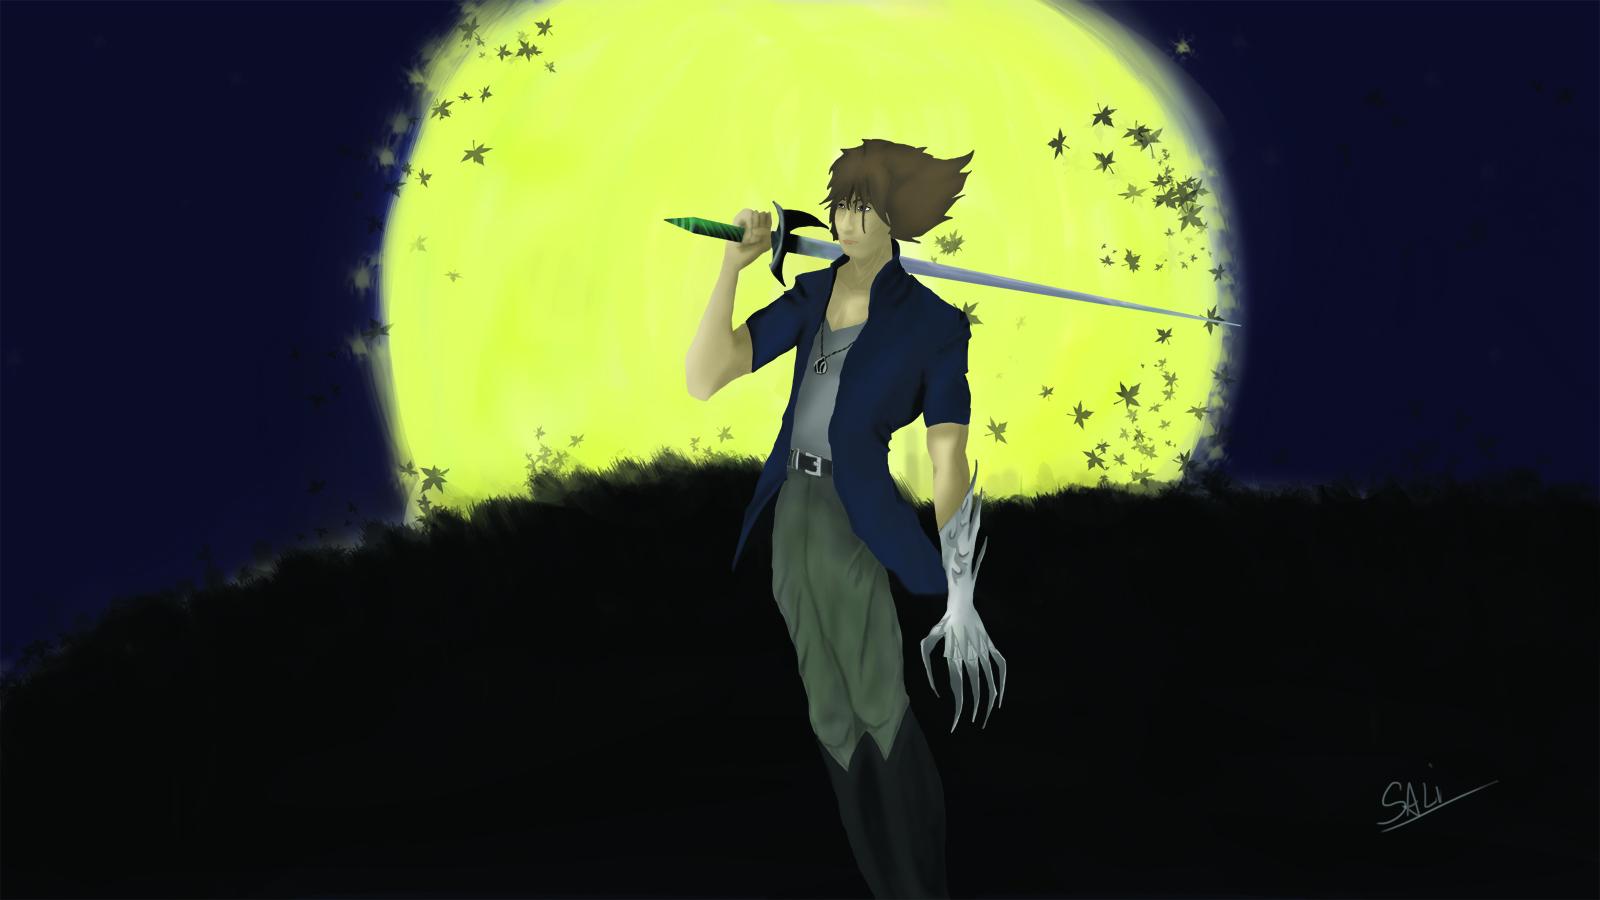 Drake- the metal hand warrior